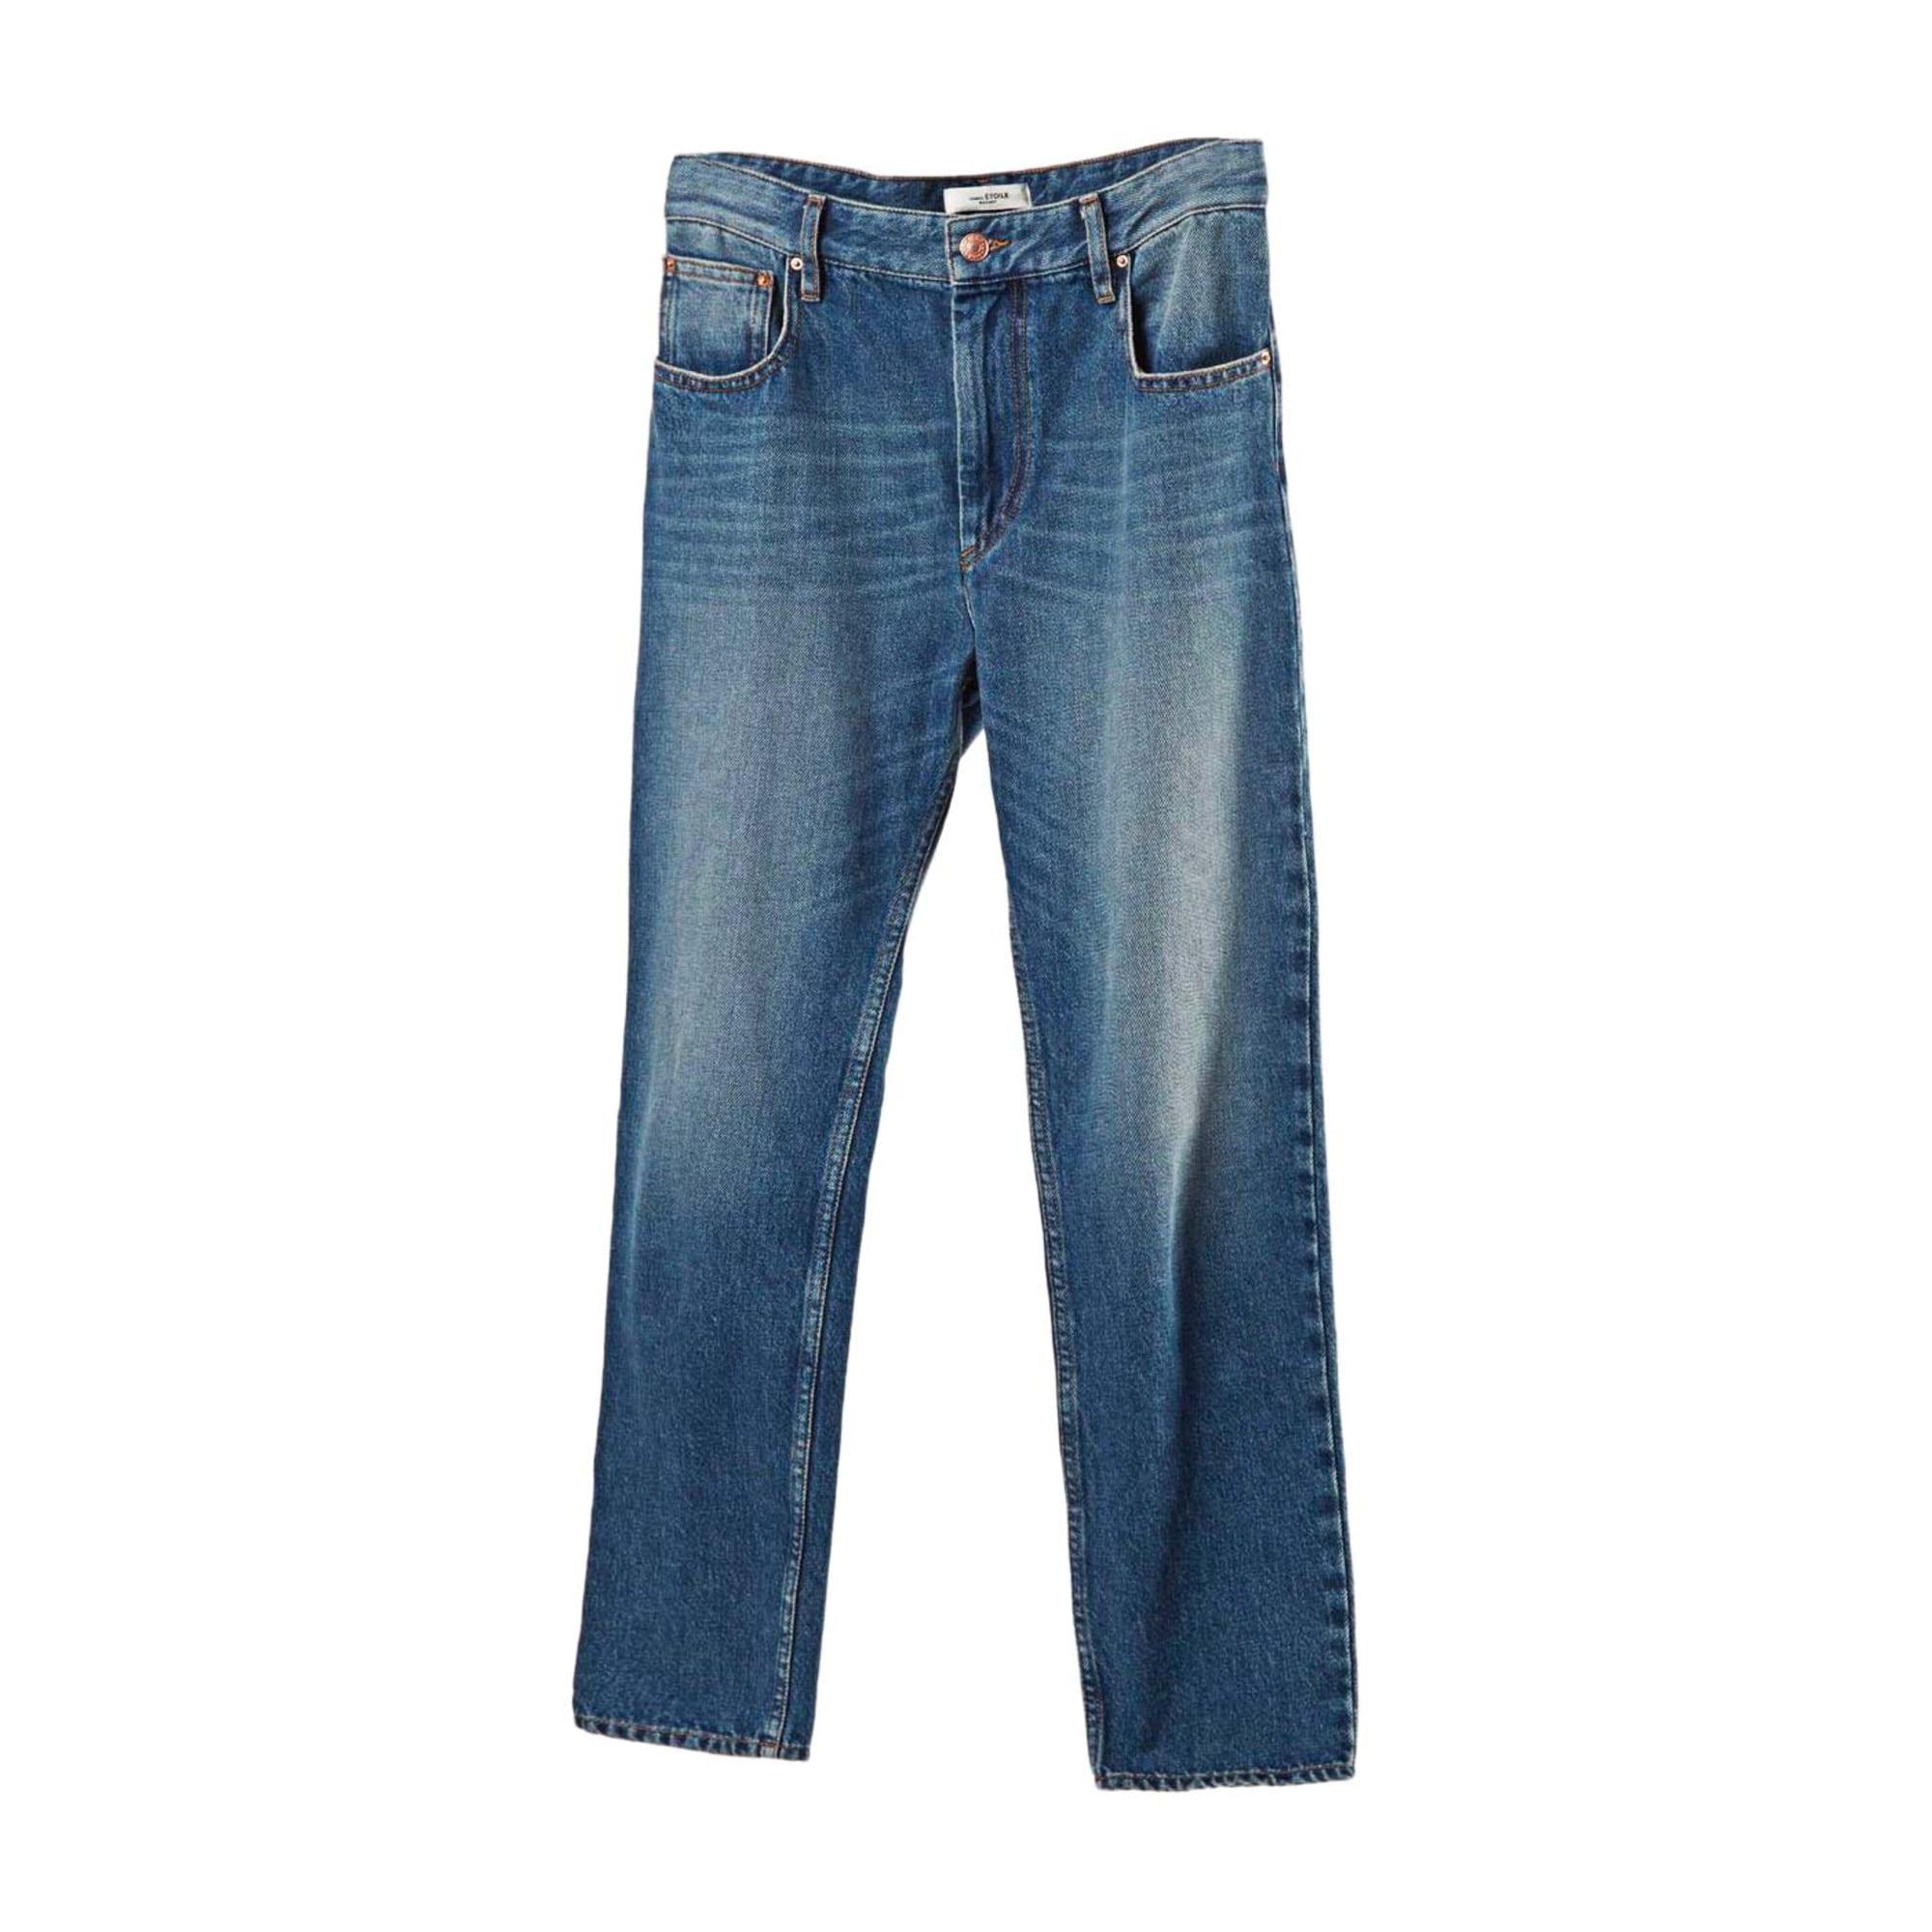 Jeans droit ISABEL MARANT ETOILE Bleu, bleu marine, bleu turquoise